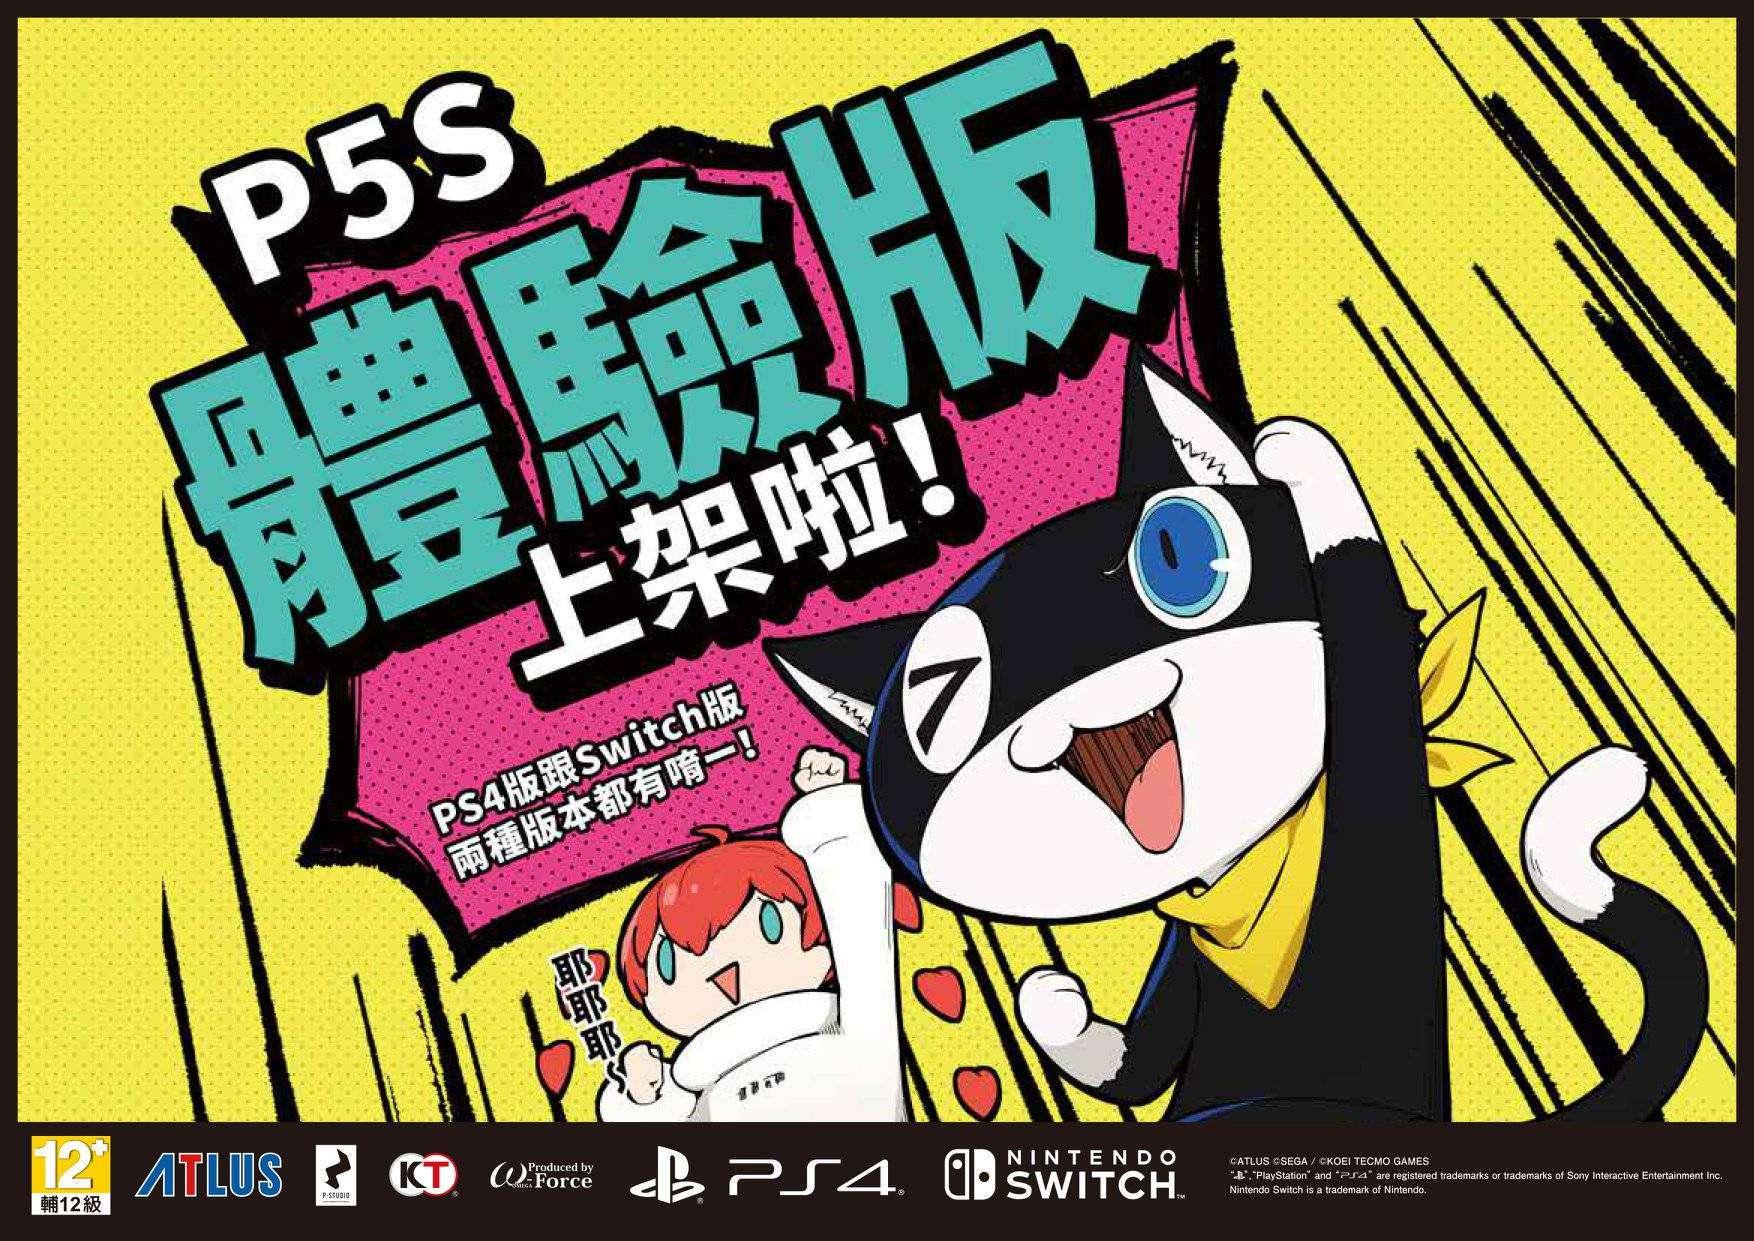 Persona 5 Scramble The Phantom Strikers Demo Release Chinese Korean Persona Central